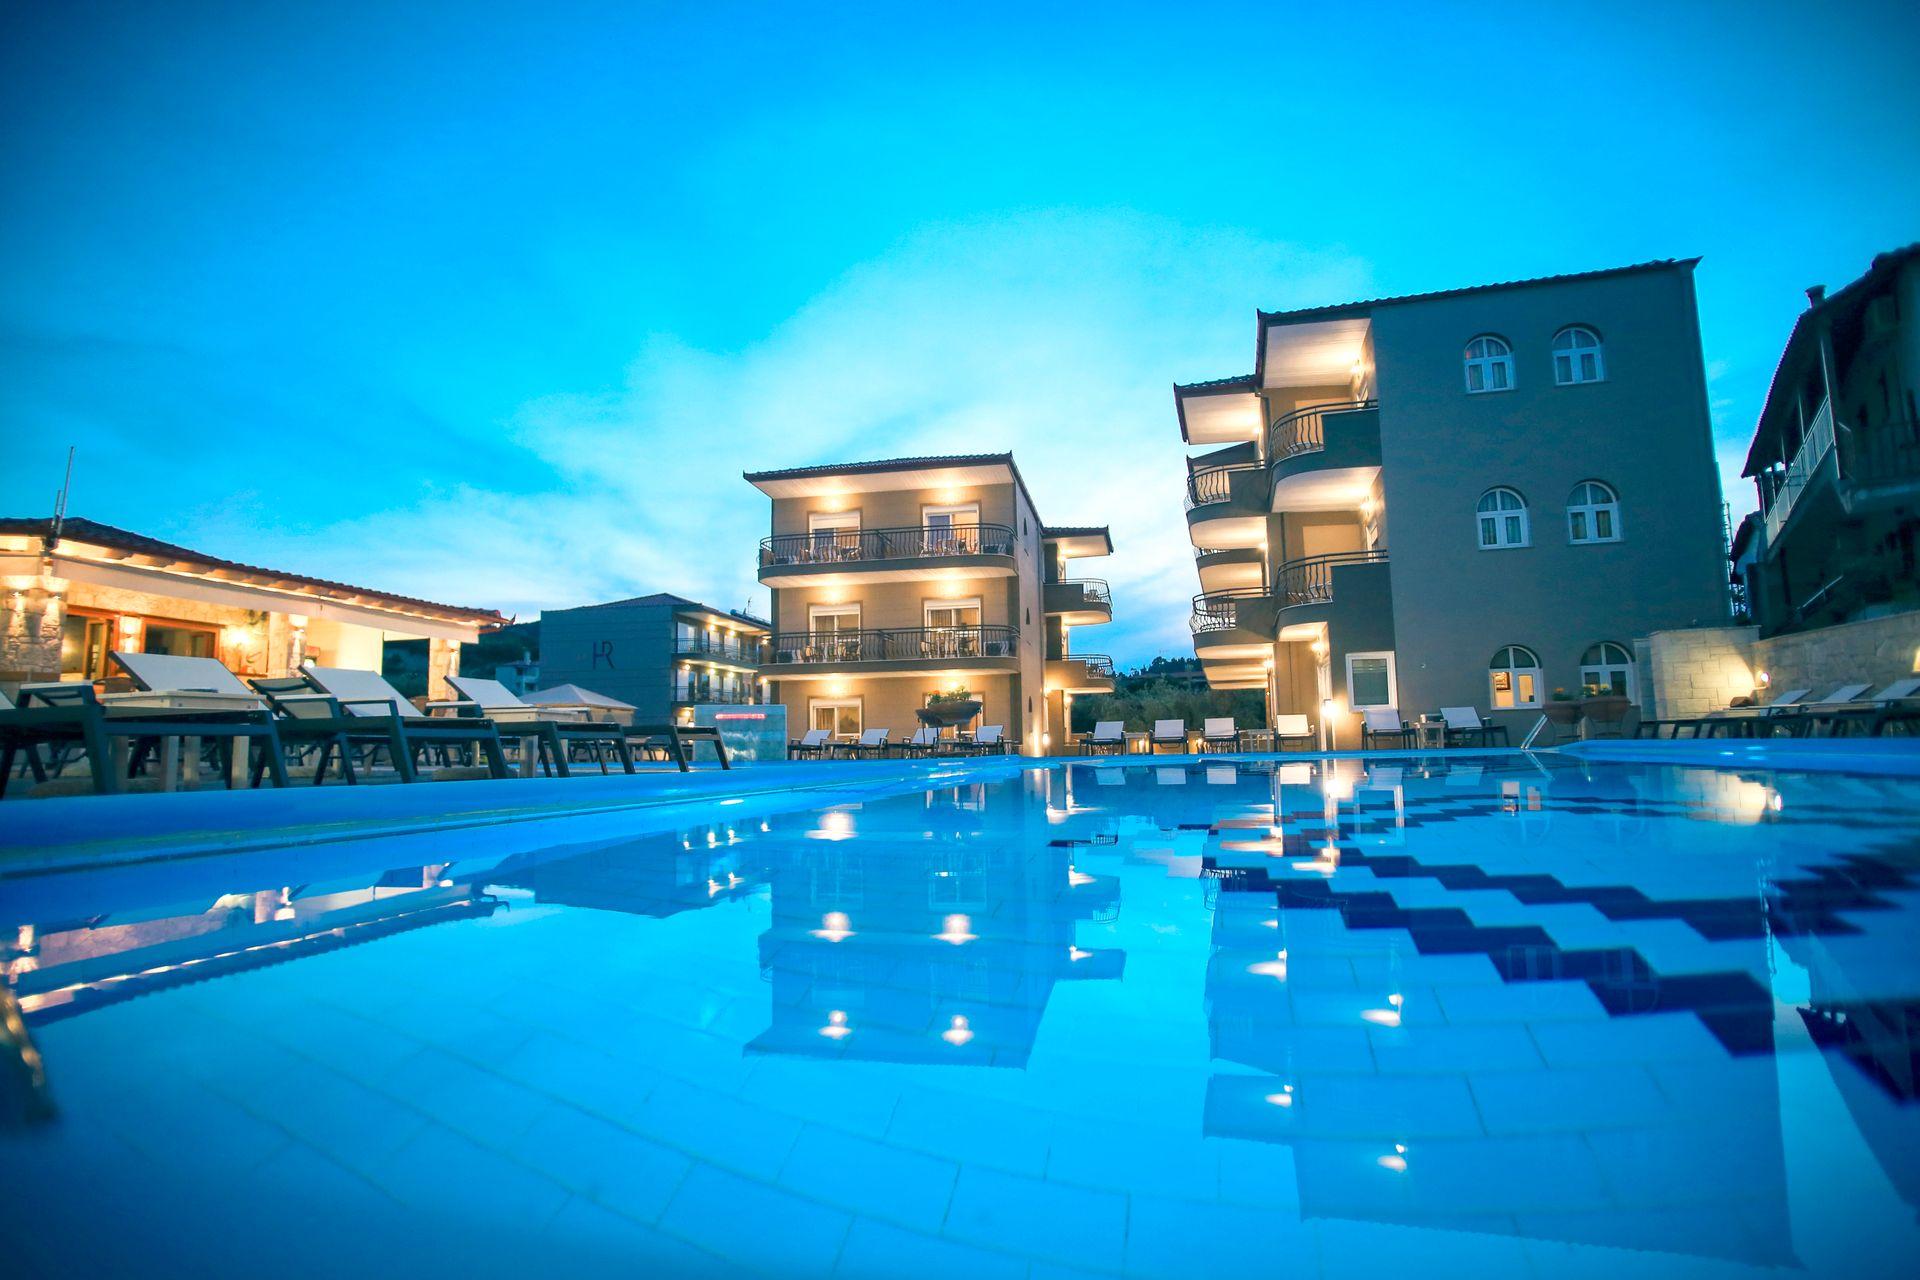 4* Royal Hotel Halkidiki - Χαλκιδική, Πολύχρονο   5 Ημέρες (4 Διανυκτερεύσεις)   2 άτομα   All Inclusive   έως 21/08/2019   Free WiFi